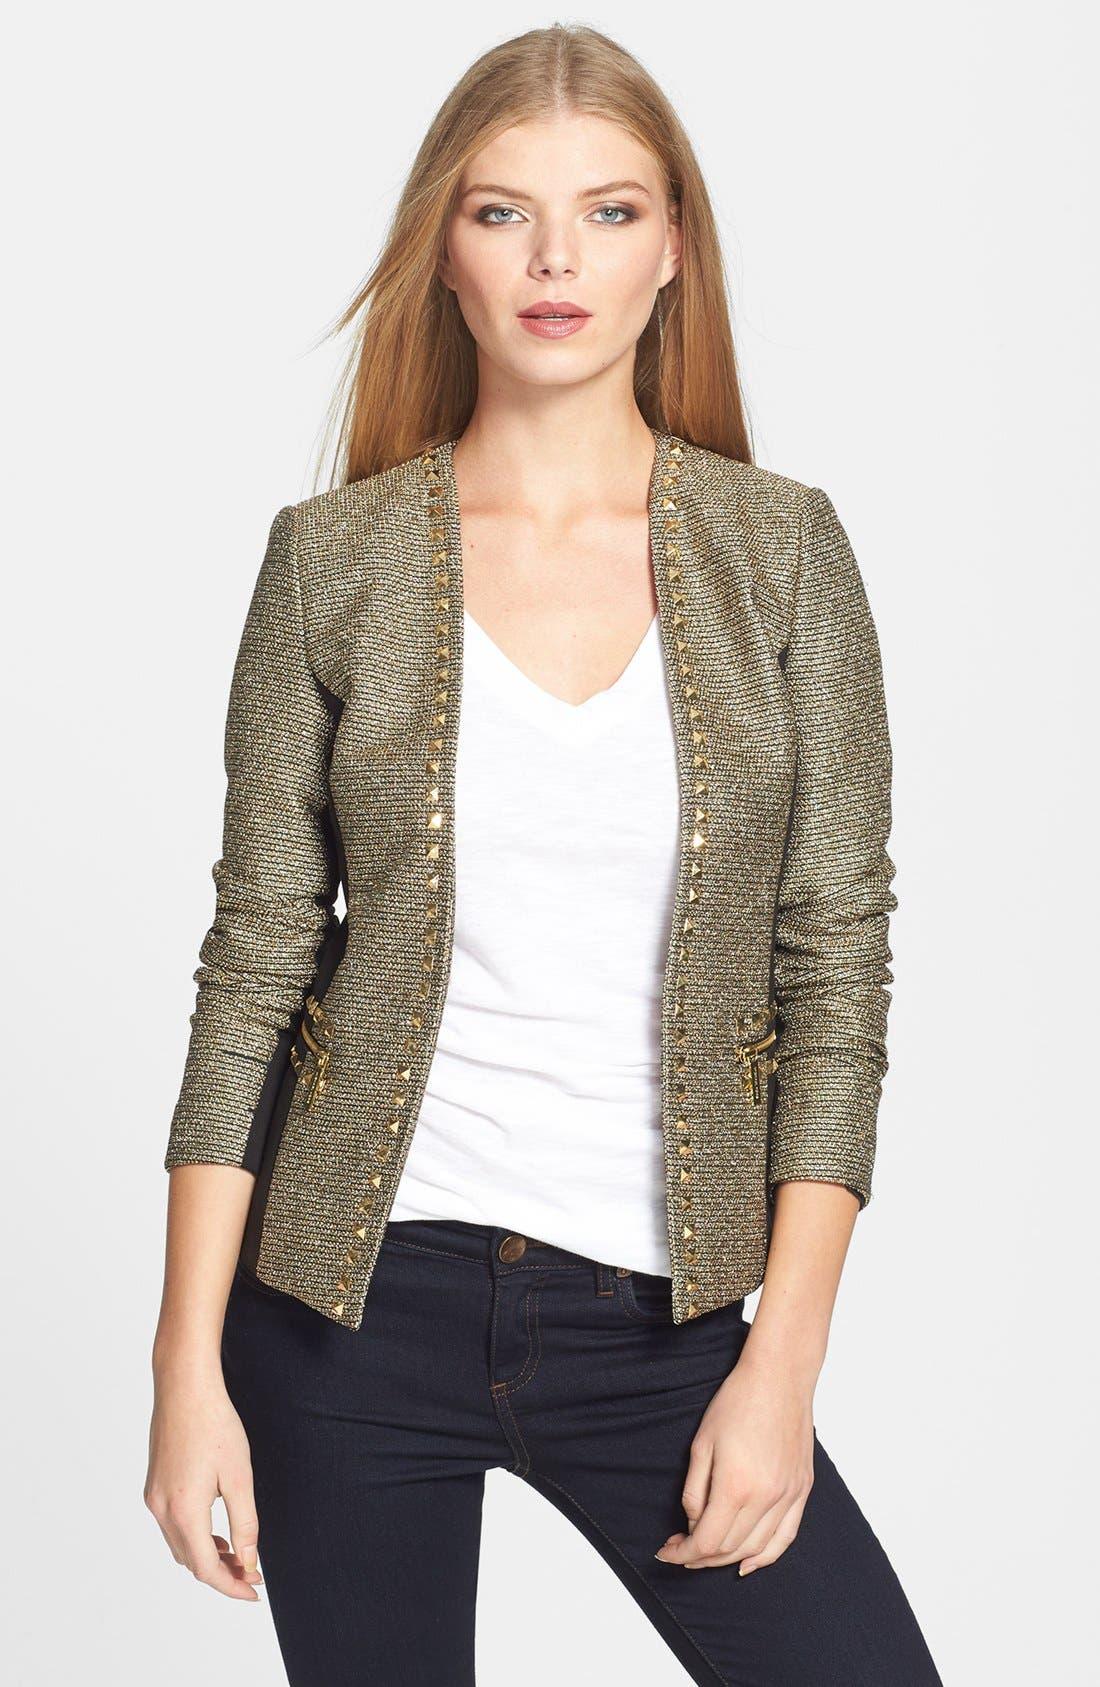 Alternate Image 1 Selected - MICHAEL Michael Kors Metallic Tweed & Ponte Knit Jacket